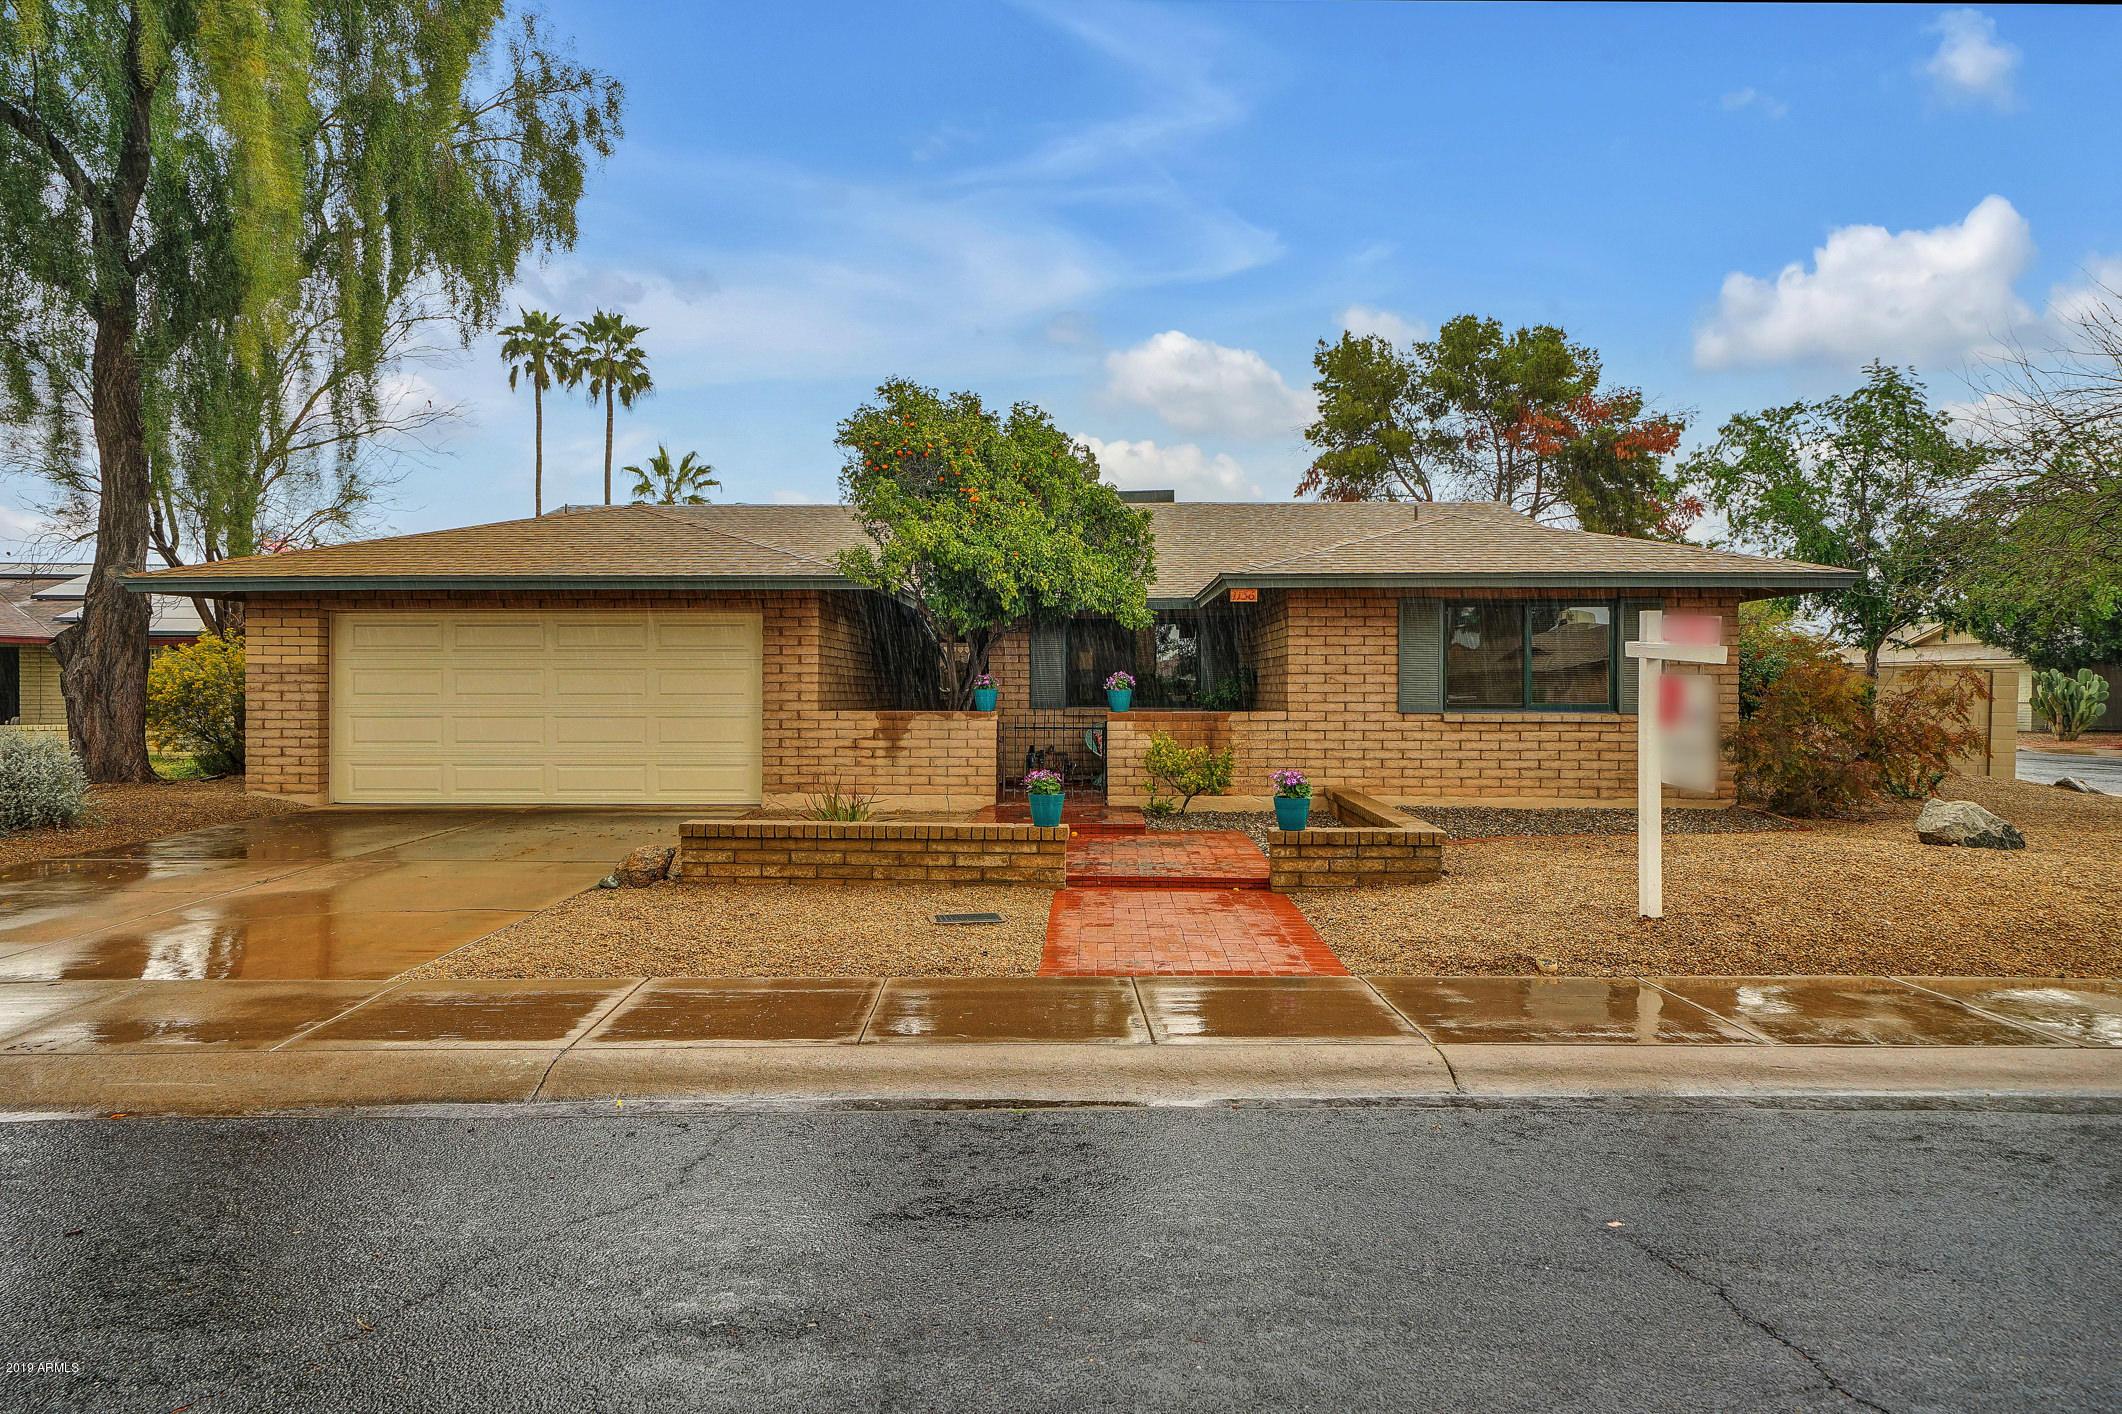 Photo of 1156 W JUANITA Circle, Mesa, AZ 85210